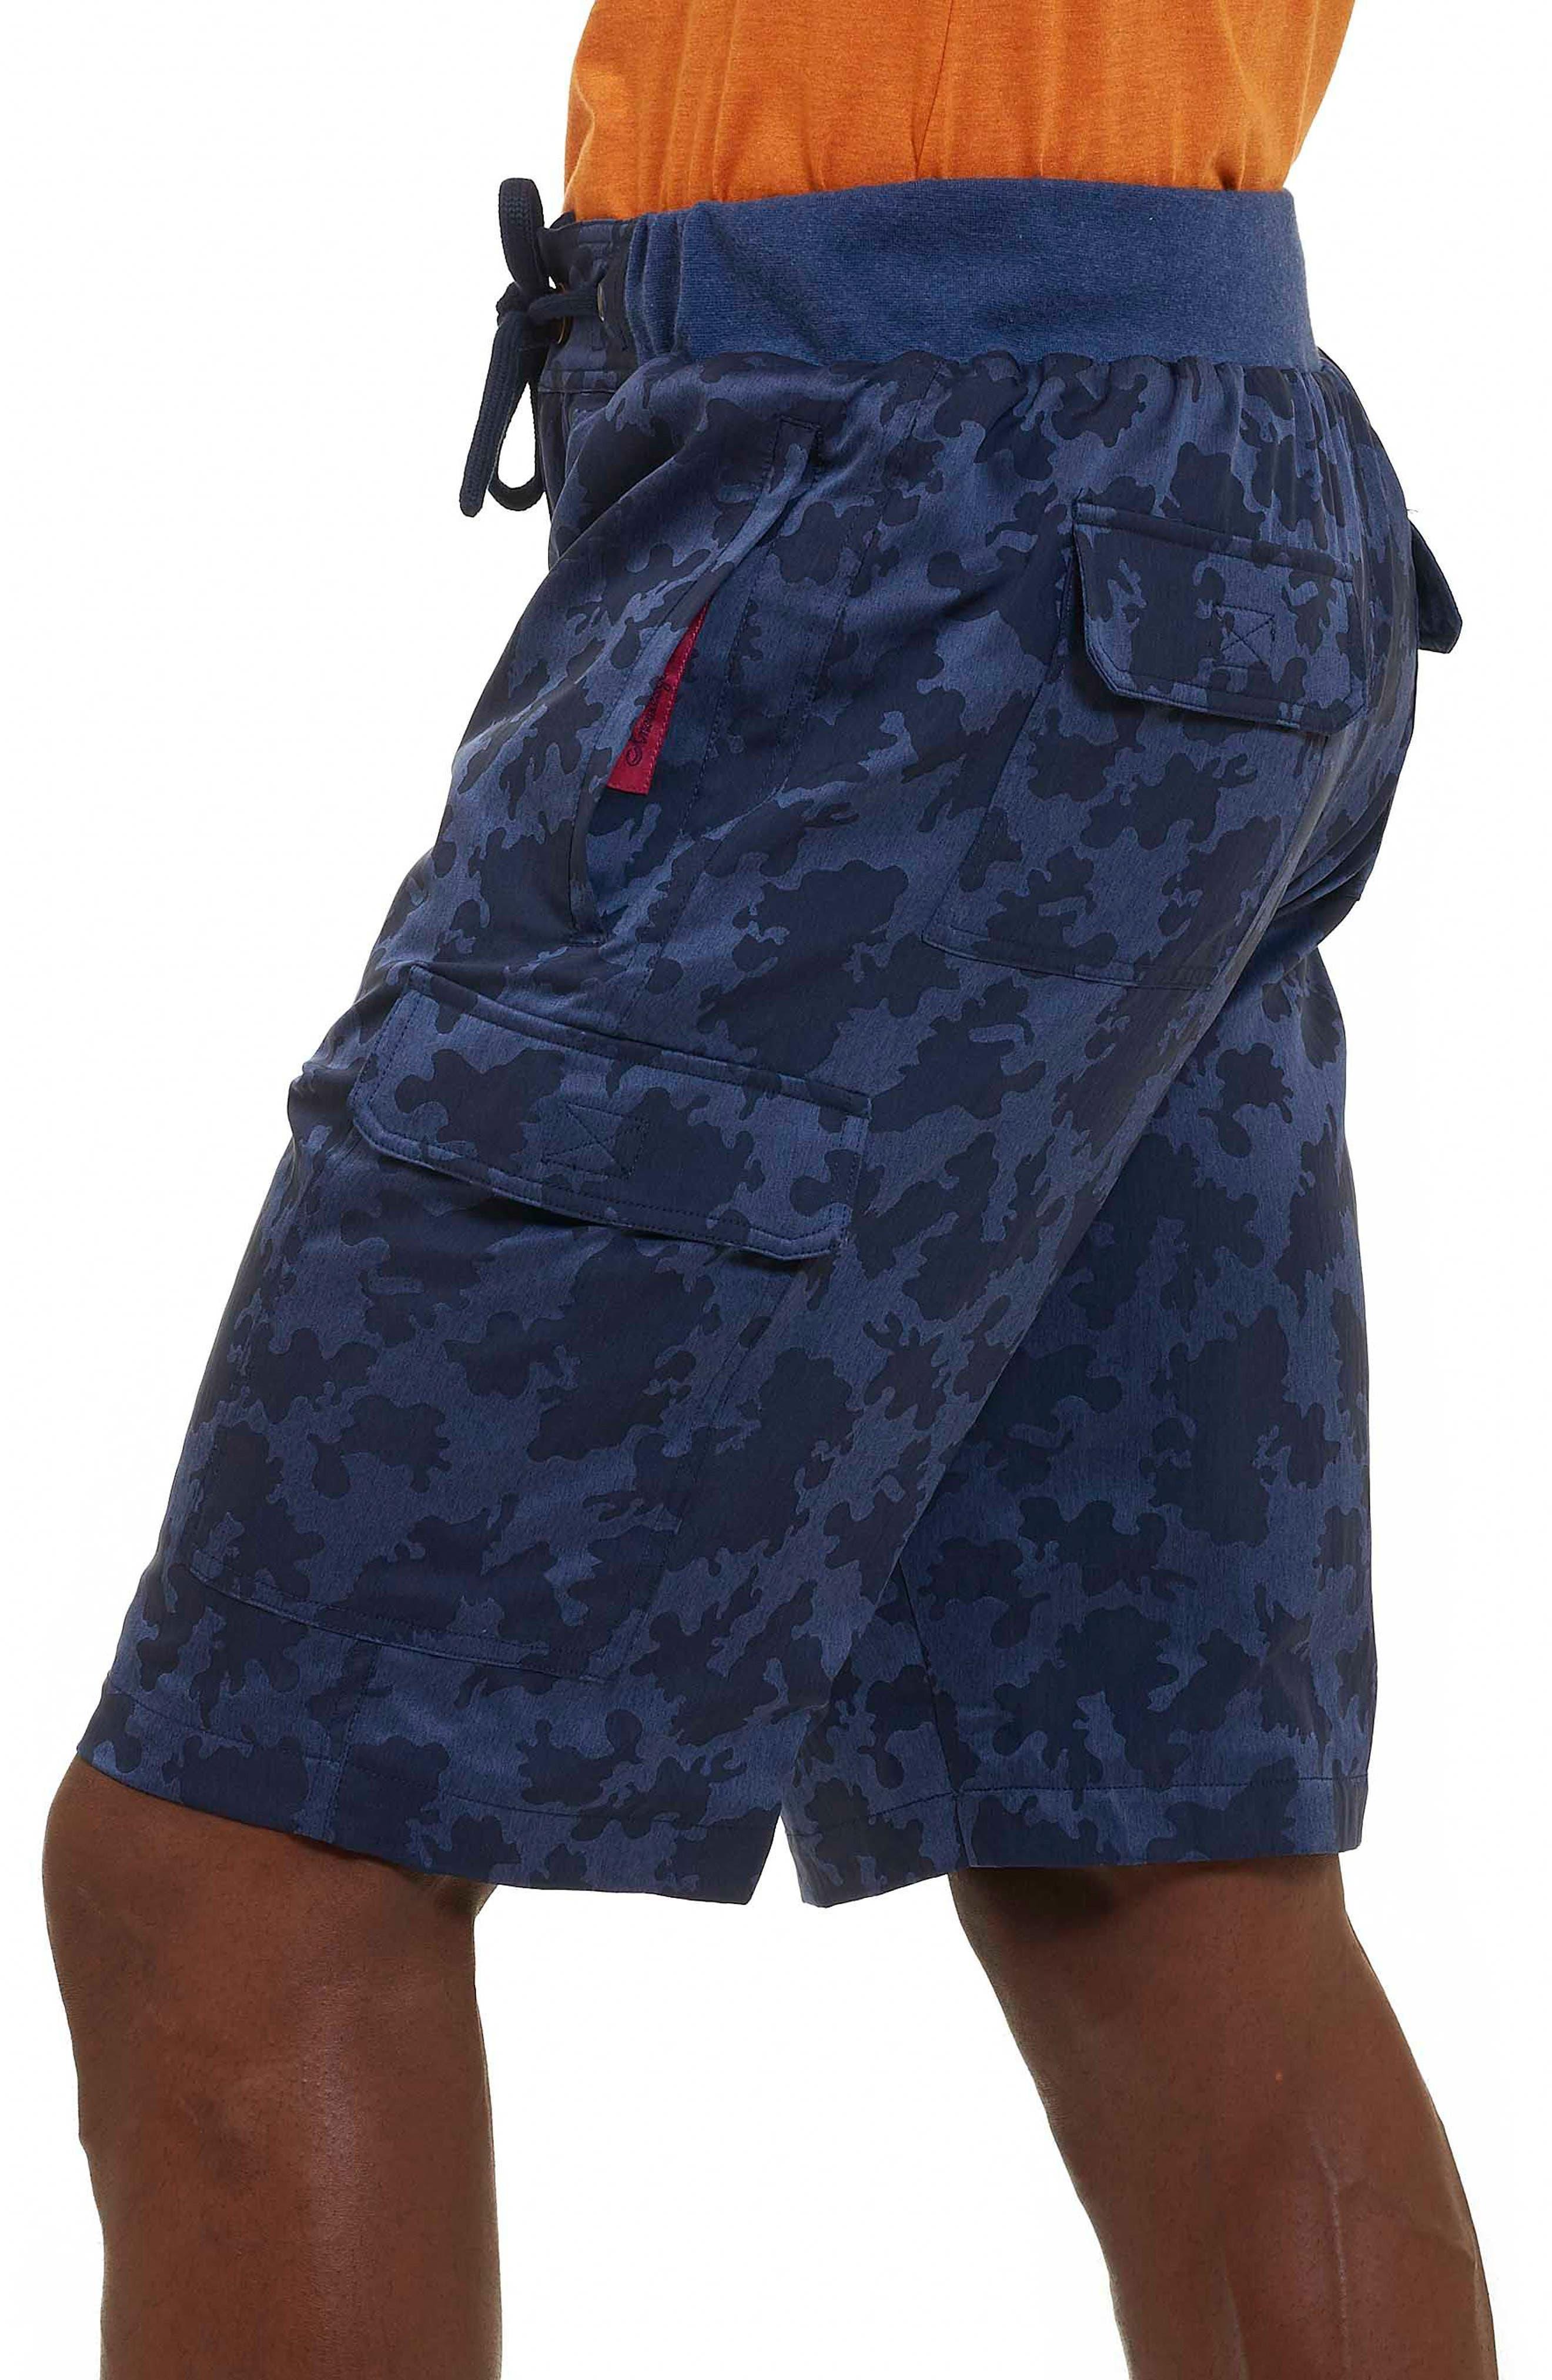 Anish Camo Cargo Shorts,                             Alternate thumbnail 3, color,                             Blue